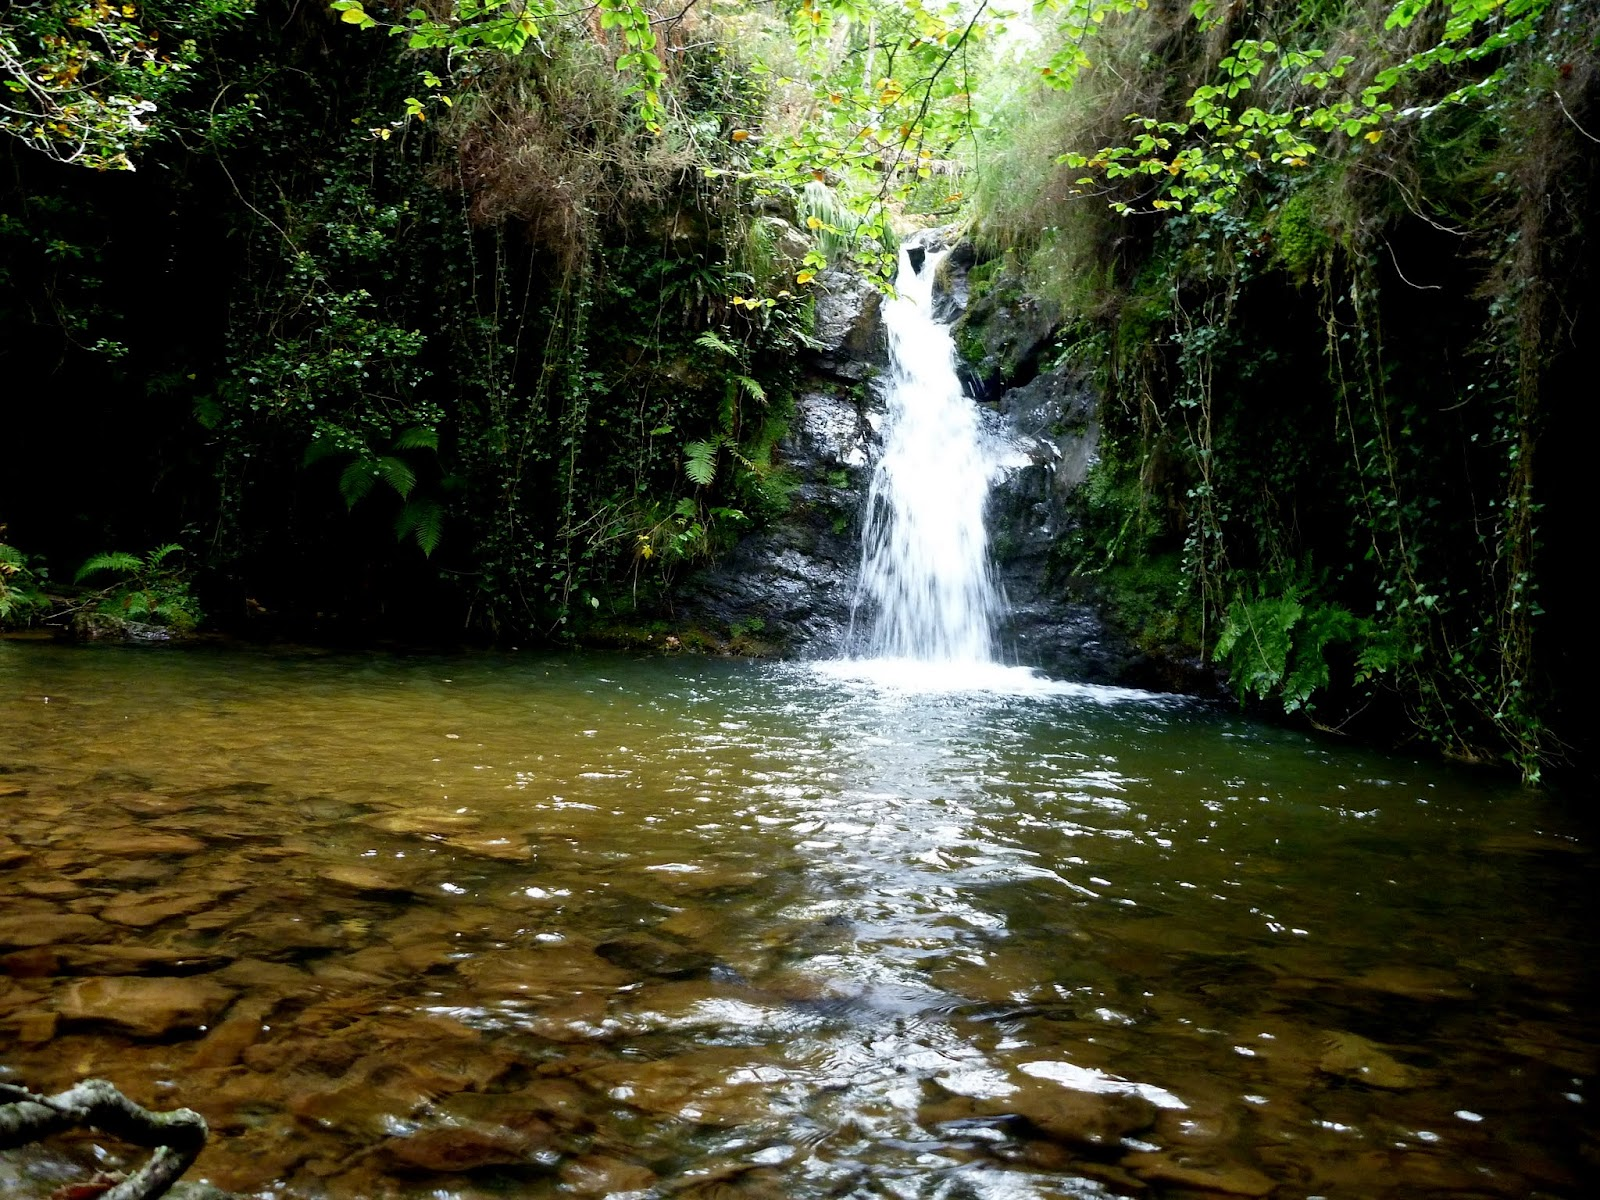 Cascadas de lami a for Fotos cascadas